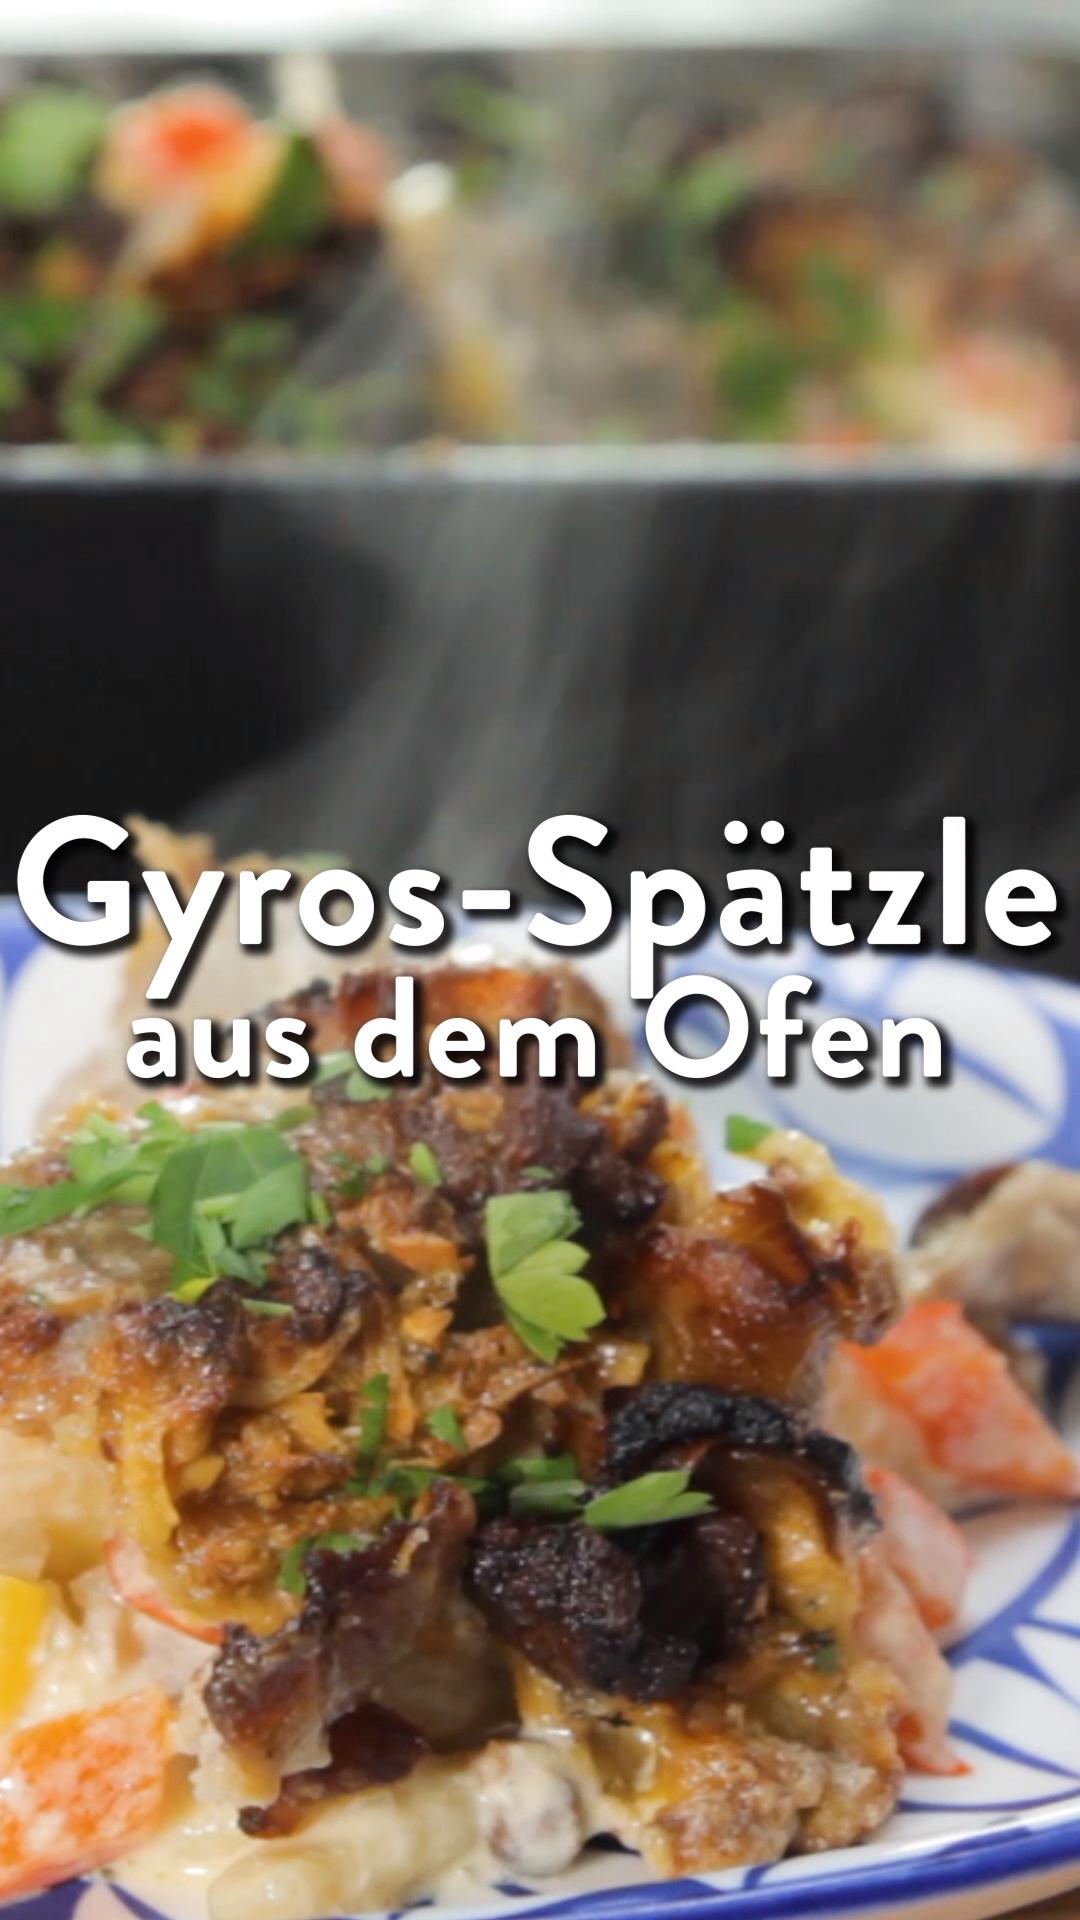 Cremige GYROS-Spätzle